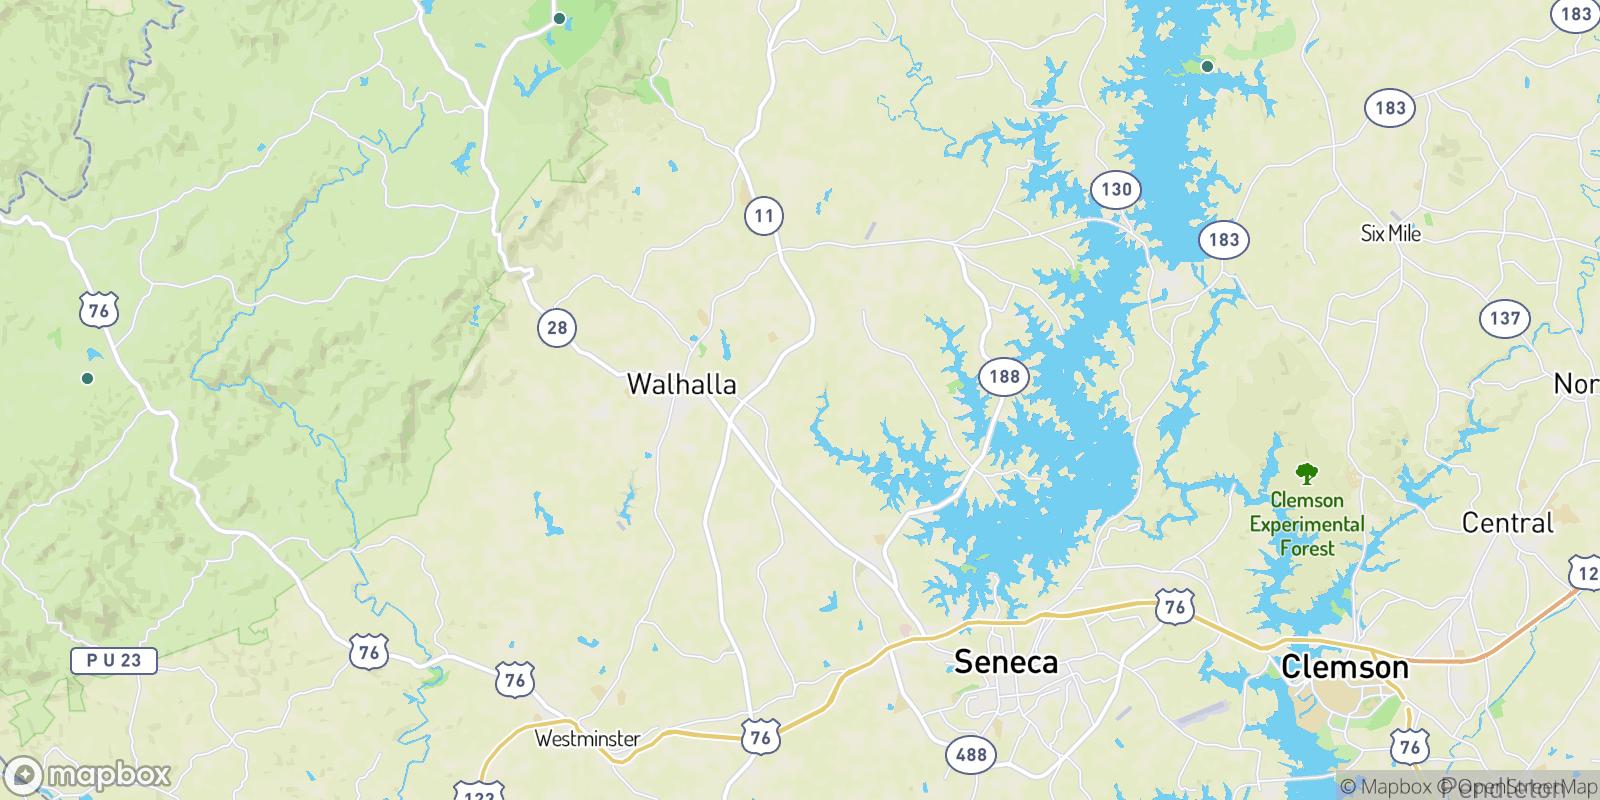 The best camping near Crystal Falls, South Carolina